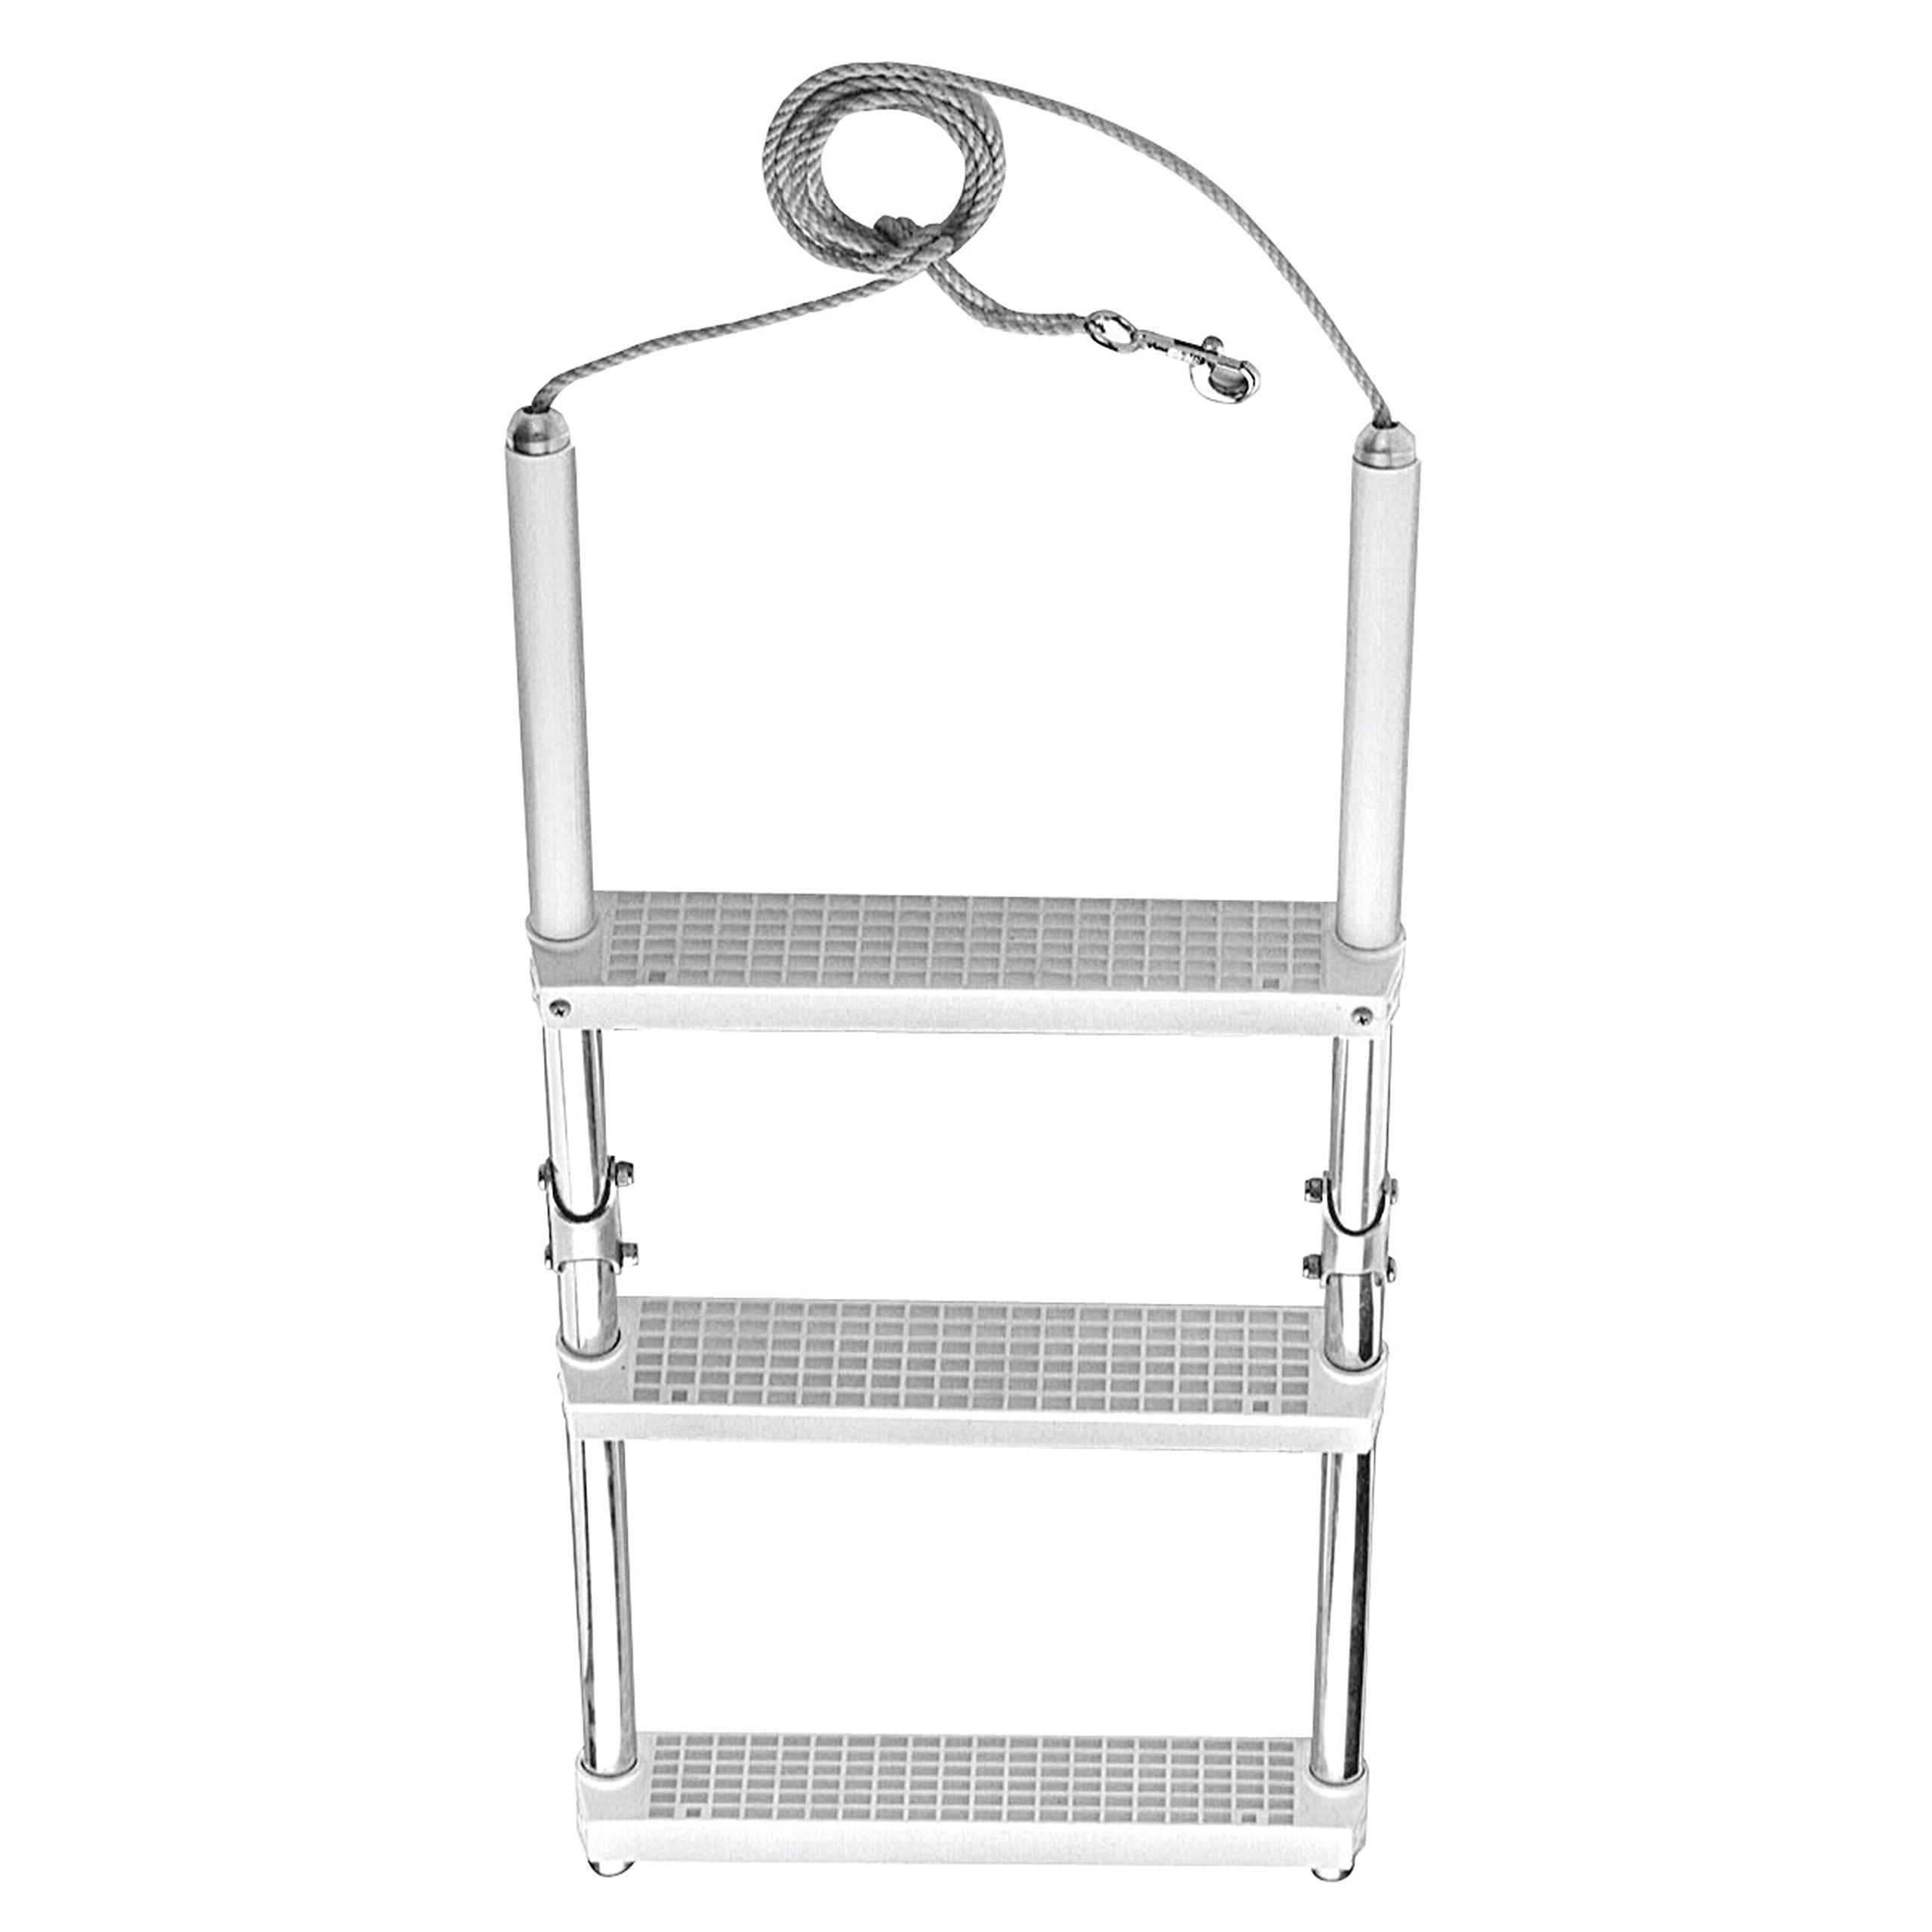 Garelick/Eez-In 13003:01 Inflatable Boat Ladder - 3 Step